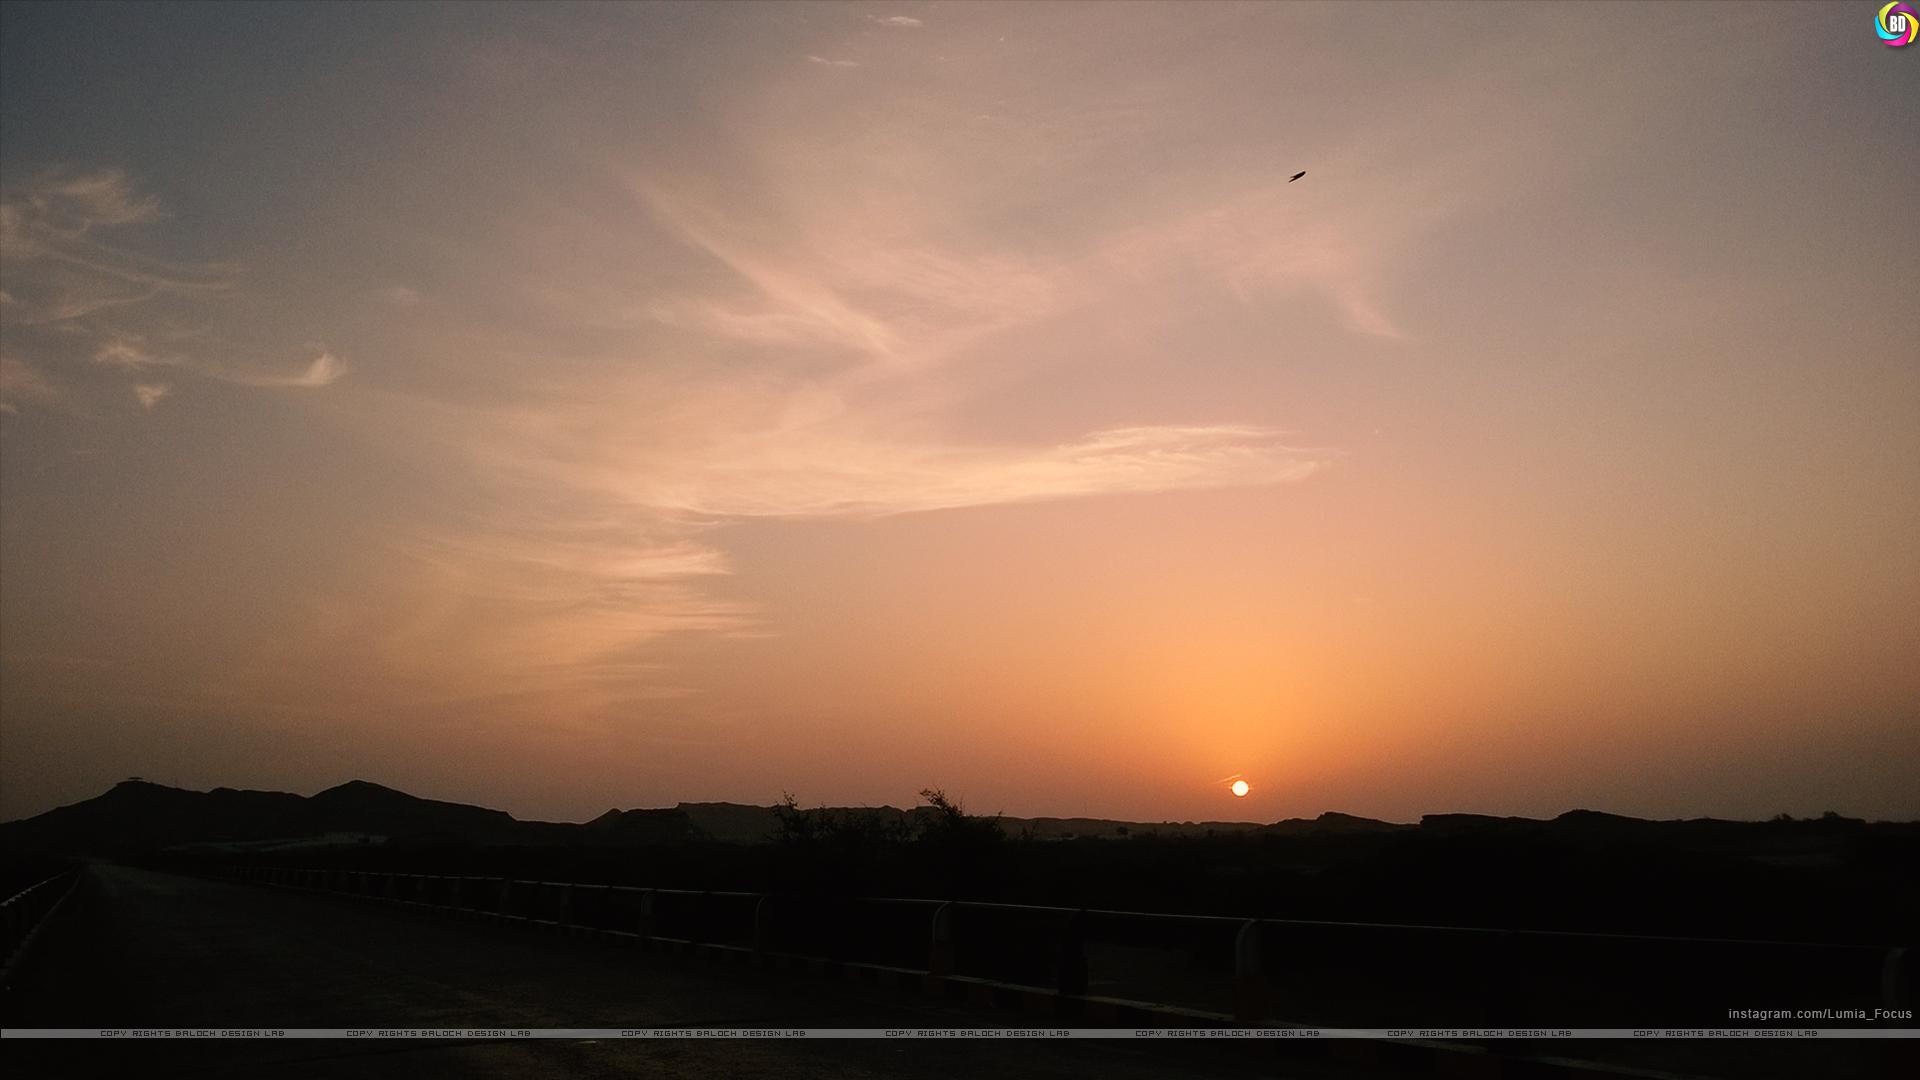 Sunset and Sky, Hingol National Park, Balochistan